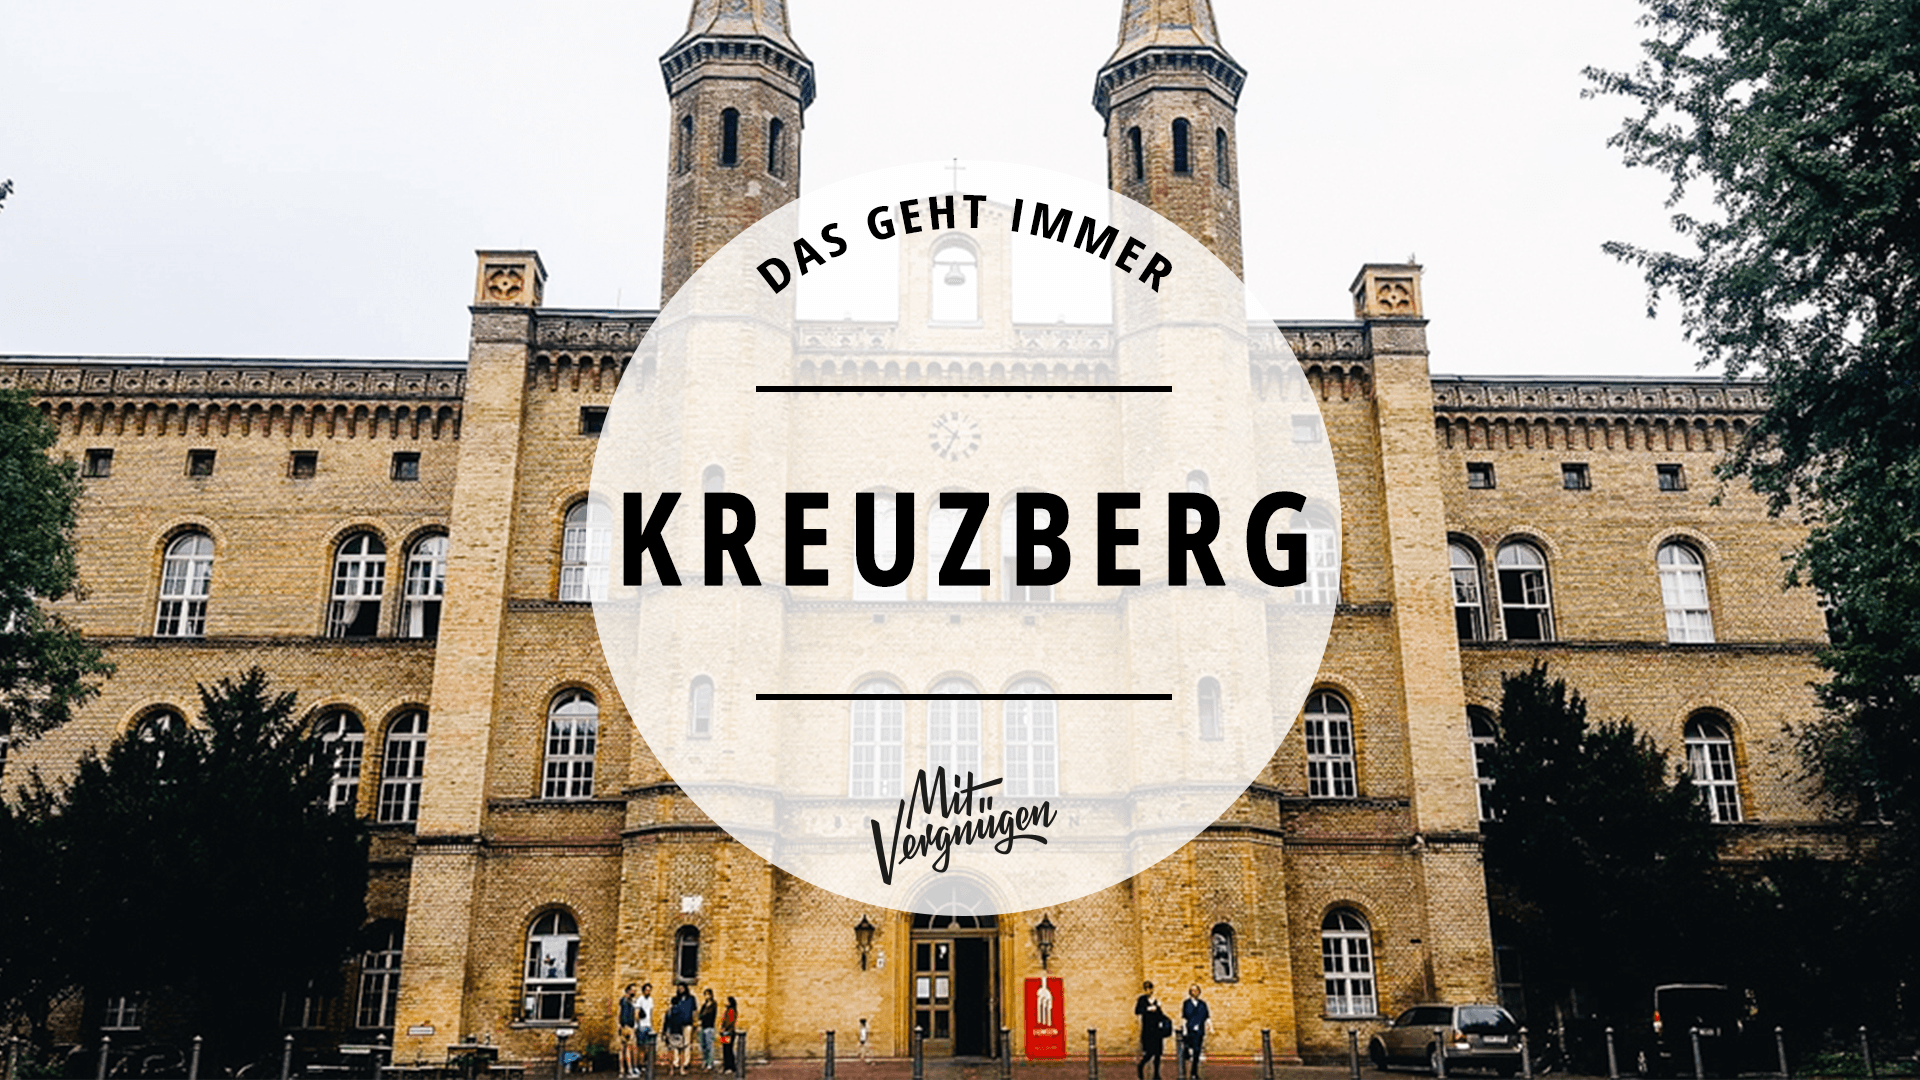 Kreuzberg Ist Nicht Nur Kotti Berlin Reise Berlin Tipps Ausfluge Berlin